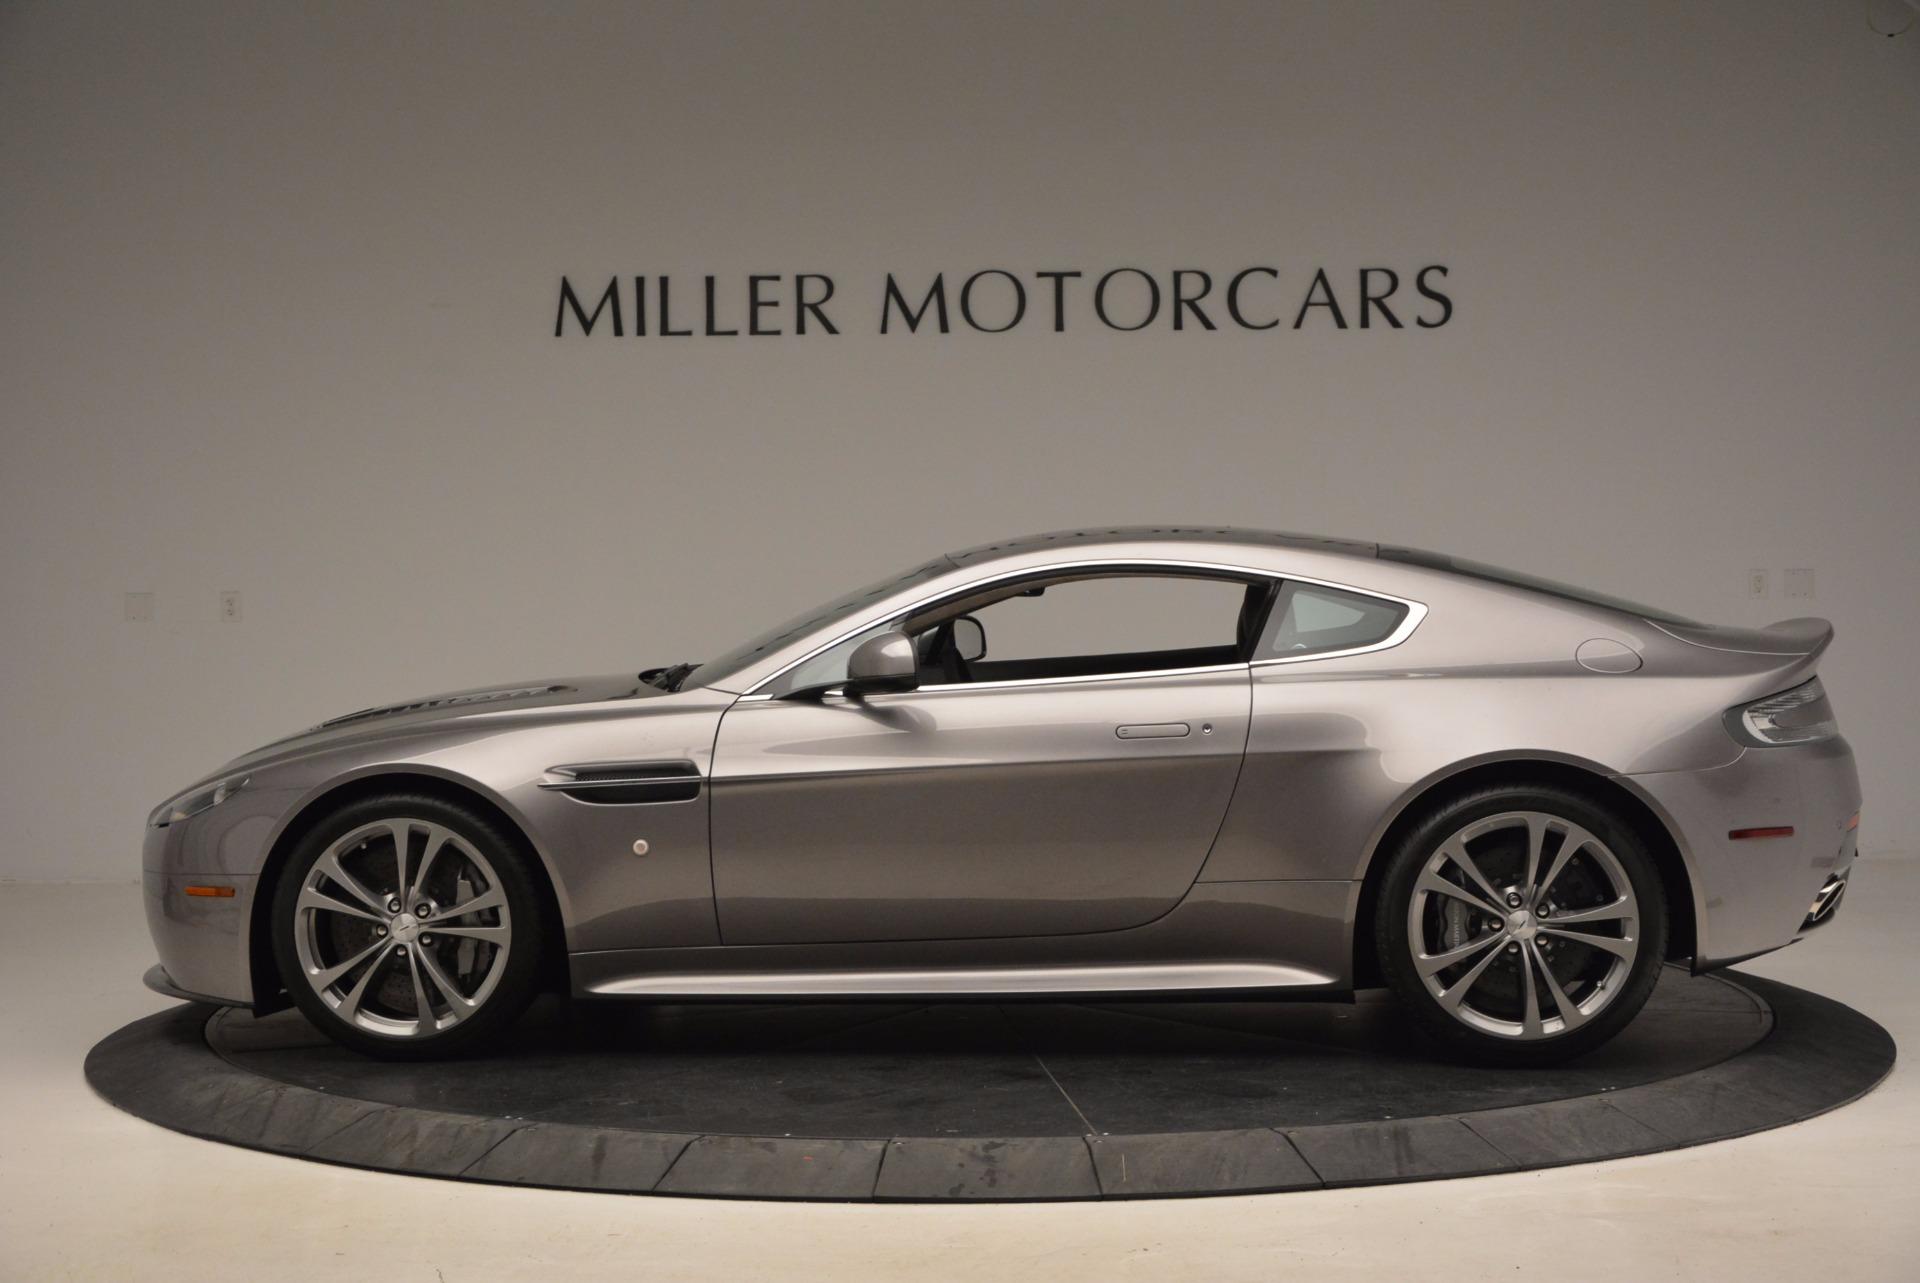 Used 2012 Aston Martin V12 Vantage  For Sale In Greenwich, CT 994_p3